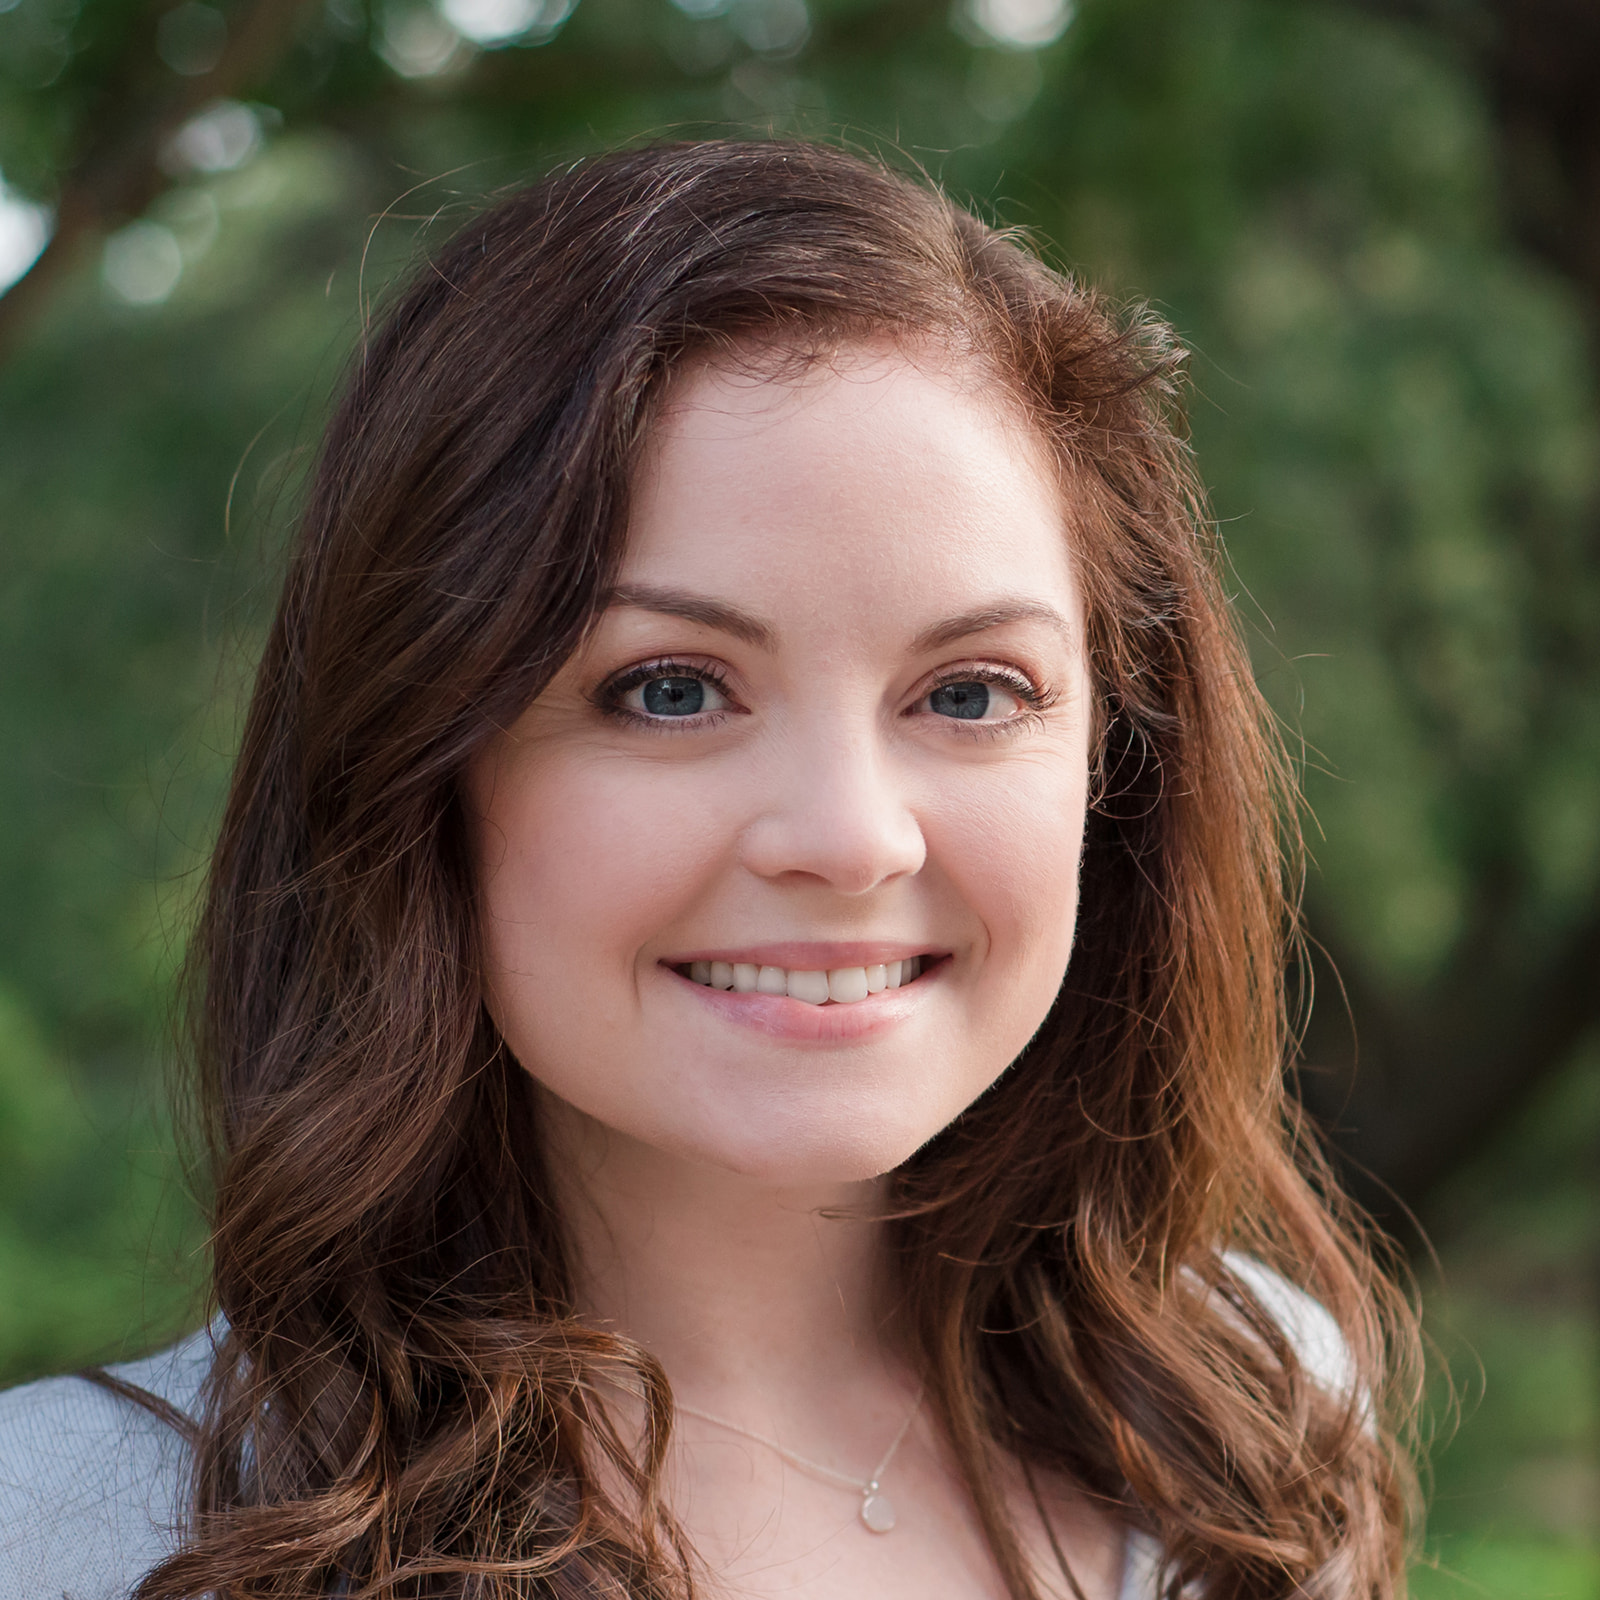 Leah Davenport